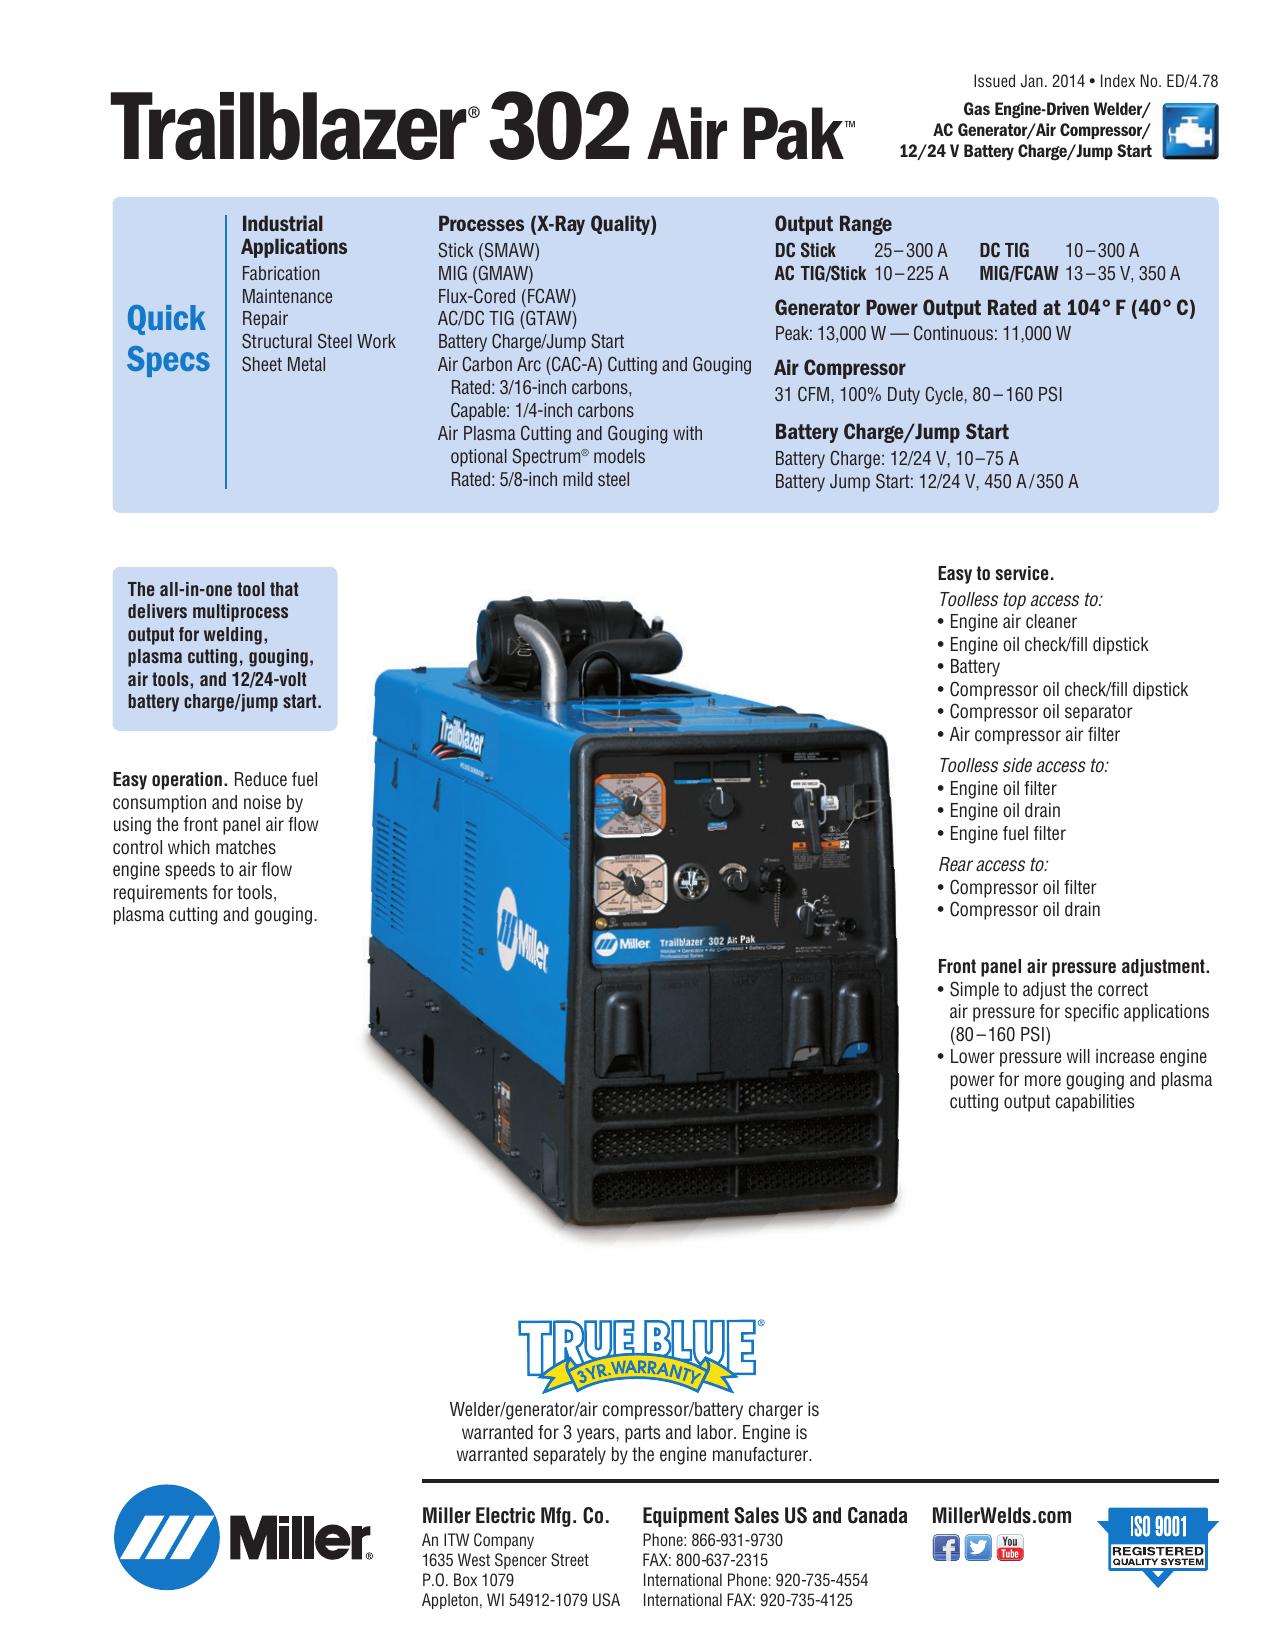 miller electric | mog-pak 6a | trailblazer� 302 air pak